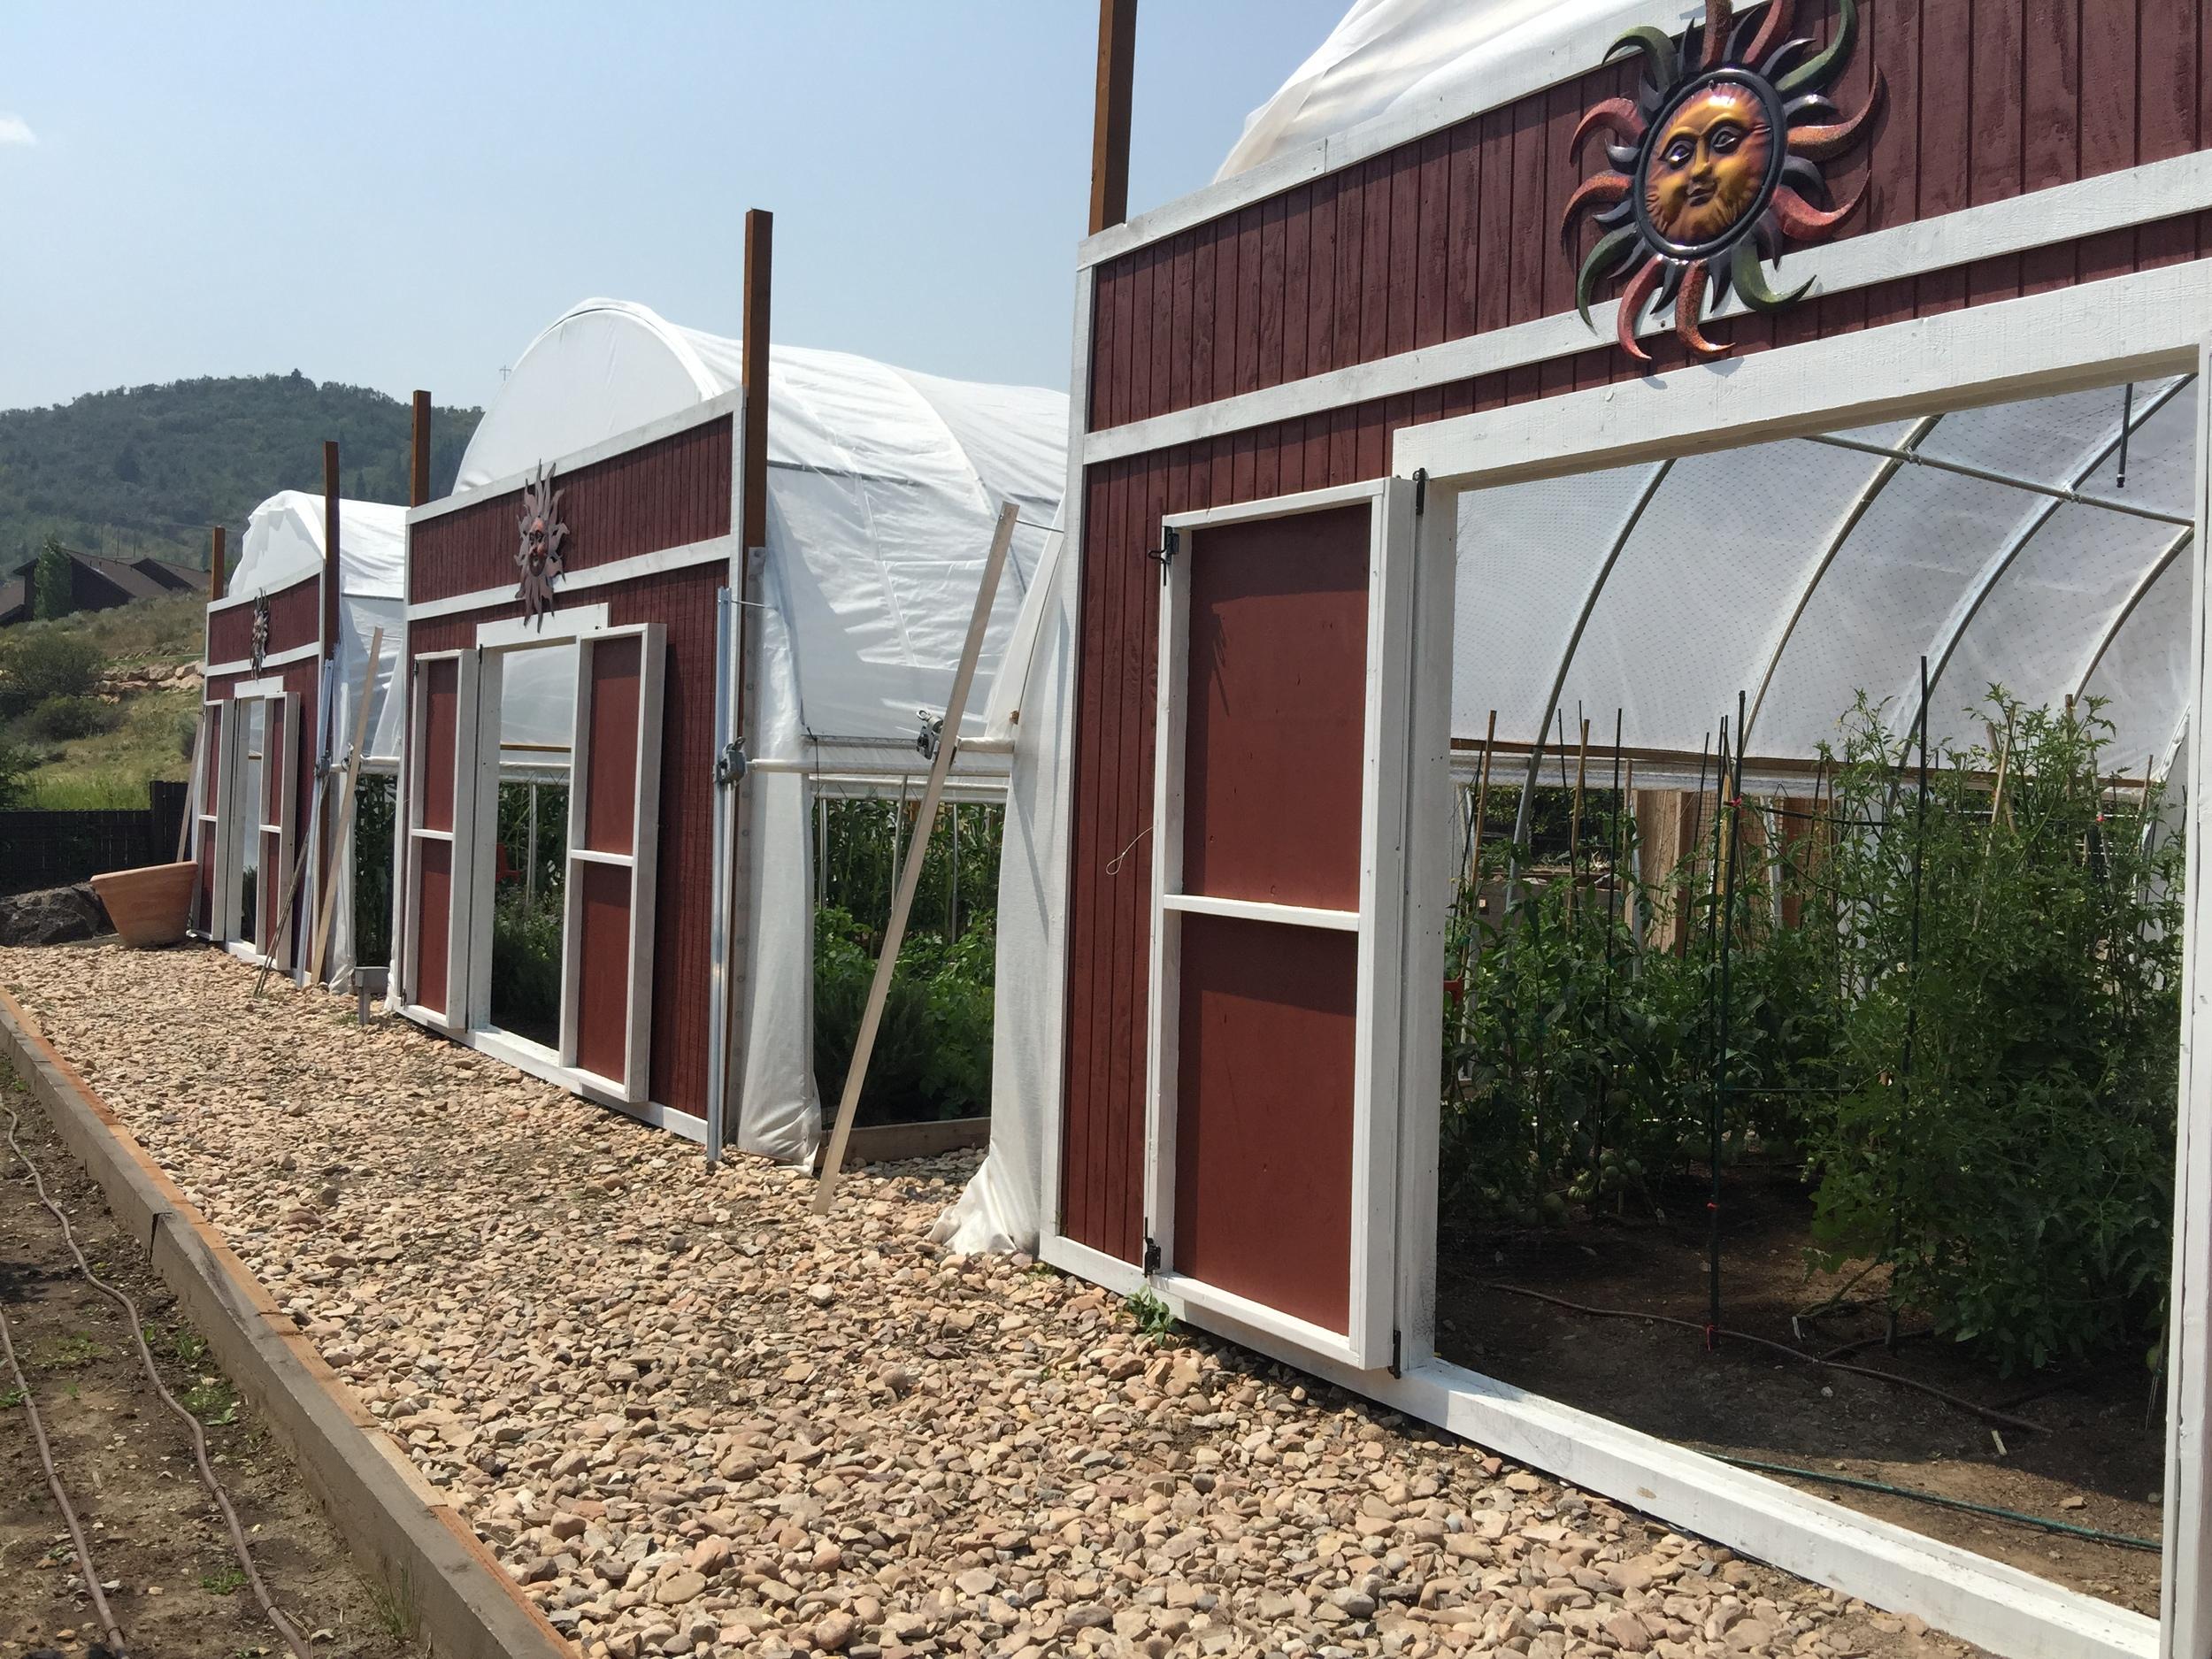 Bill White Farms Greenhouses